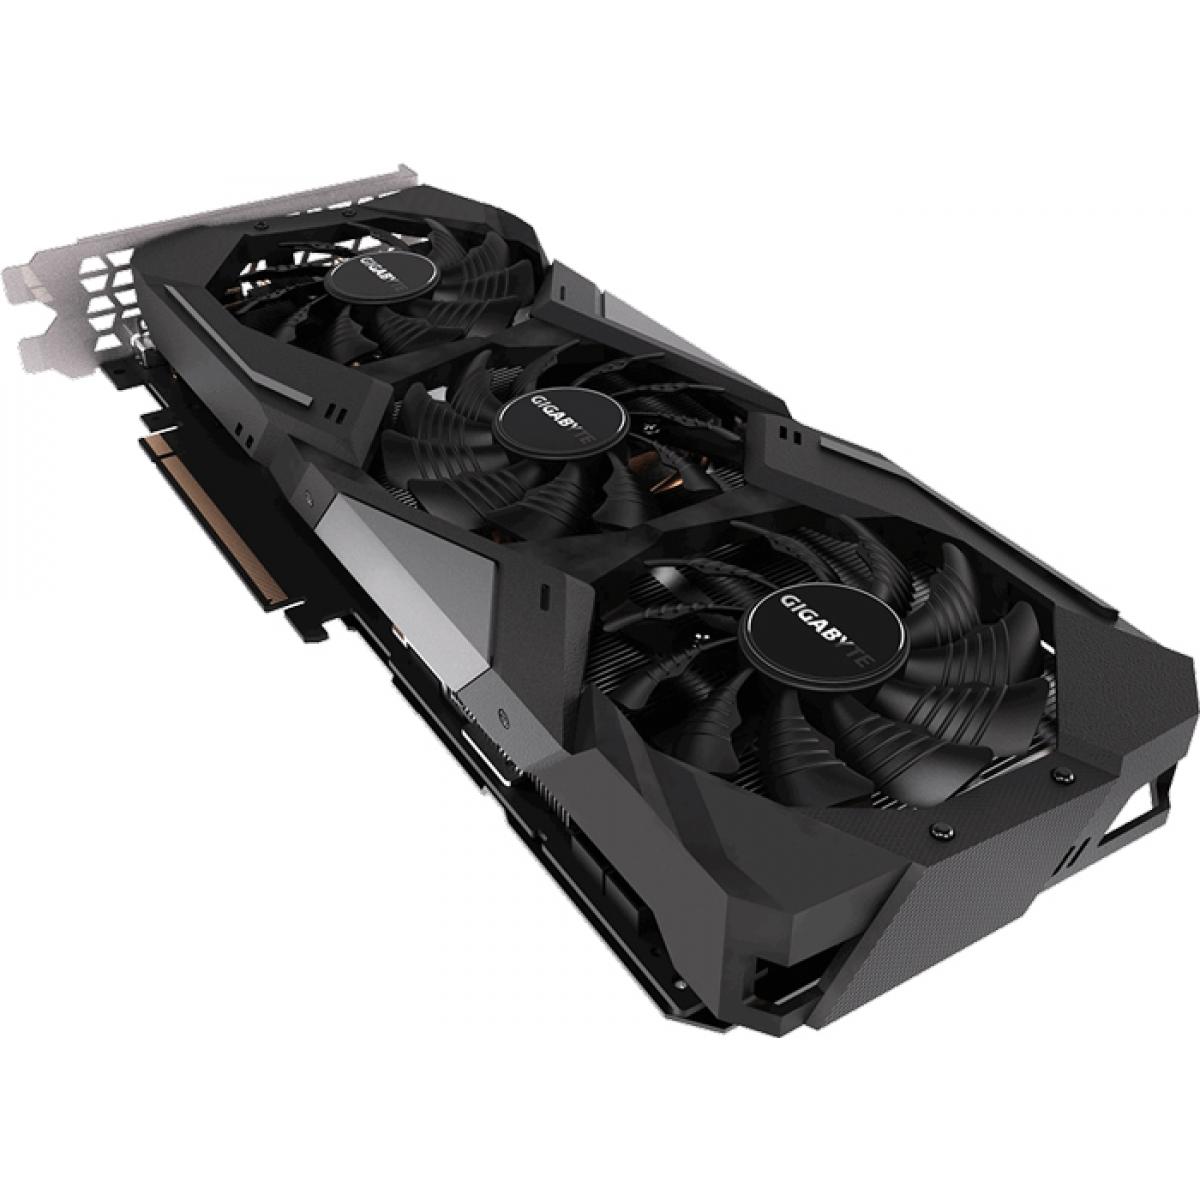 Placa de Vídeo Gigabyte Geforce RTX 2070 Gaming, 8GB GDDR6, 256Bit, GV-N2070GAMING-8GC